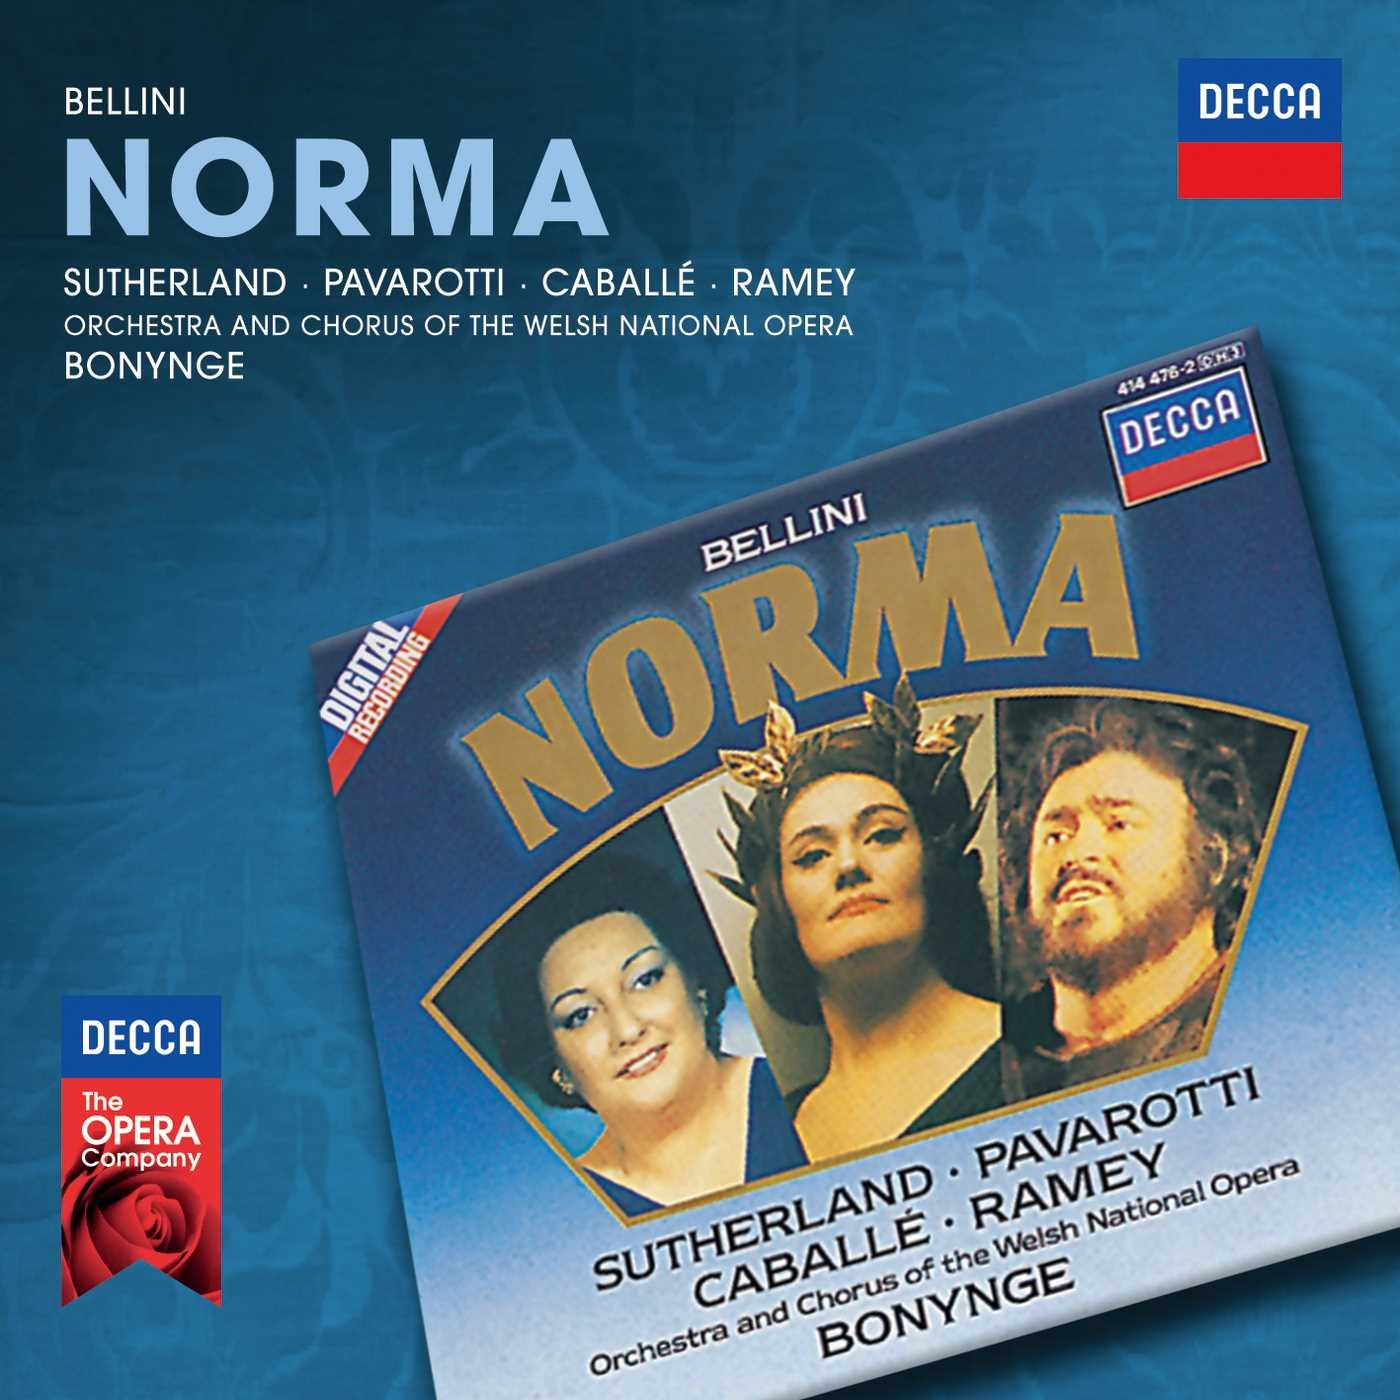 Bellini - Norma / Sutherland · Horne · J. Alexander · R. Cross · LSO · Bonynge